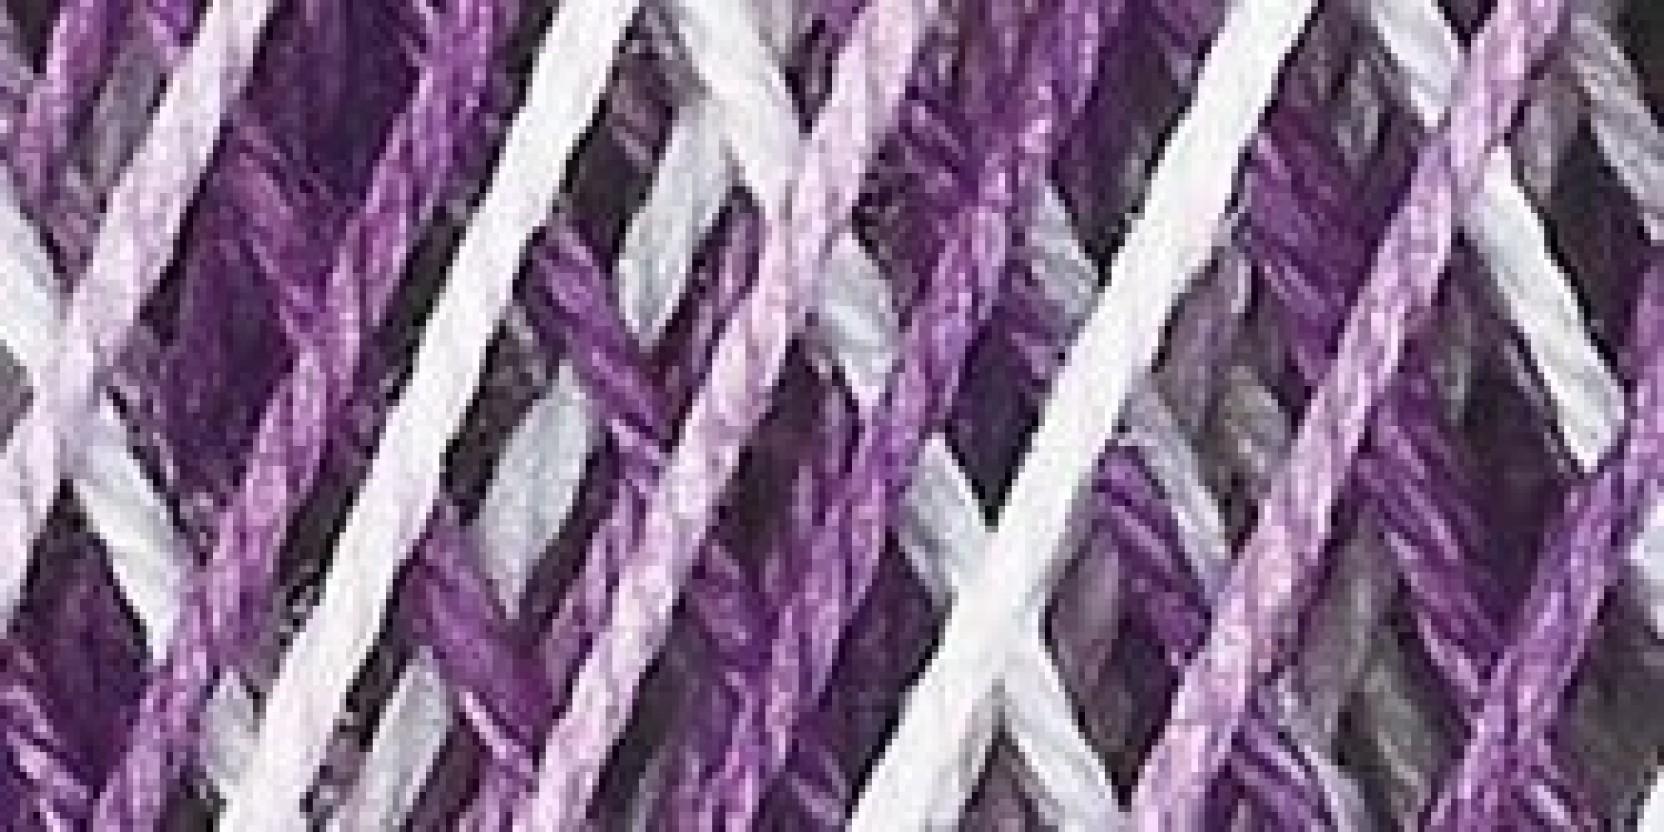 Coats Crochet South Maid Crochet Cotton Thread Size 10 Shades Of